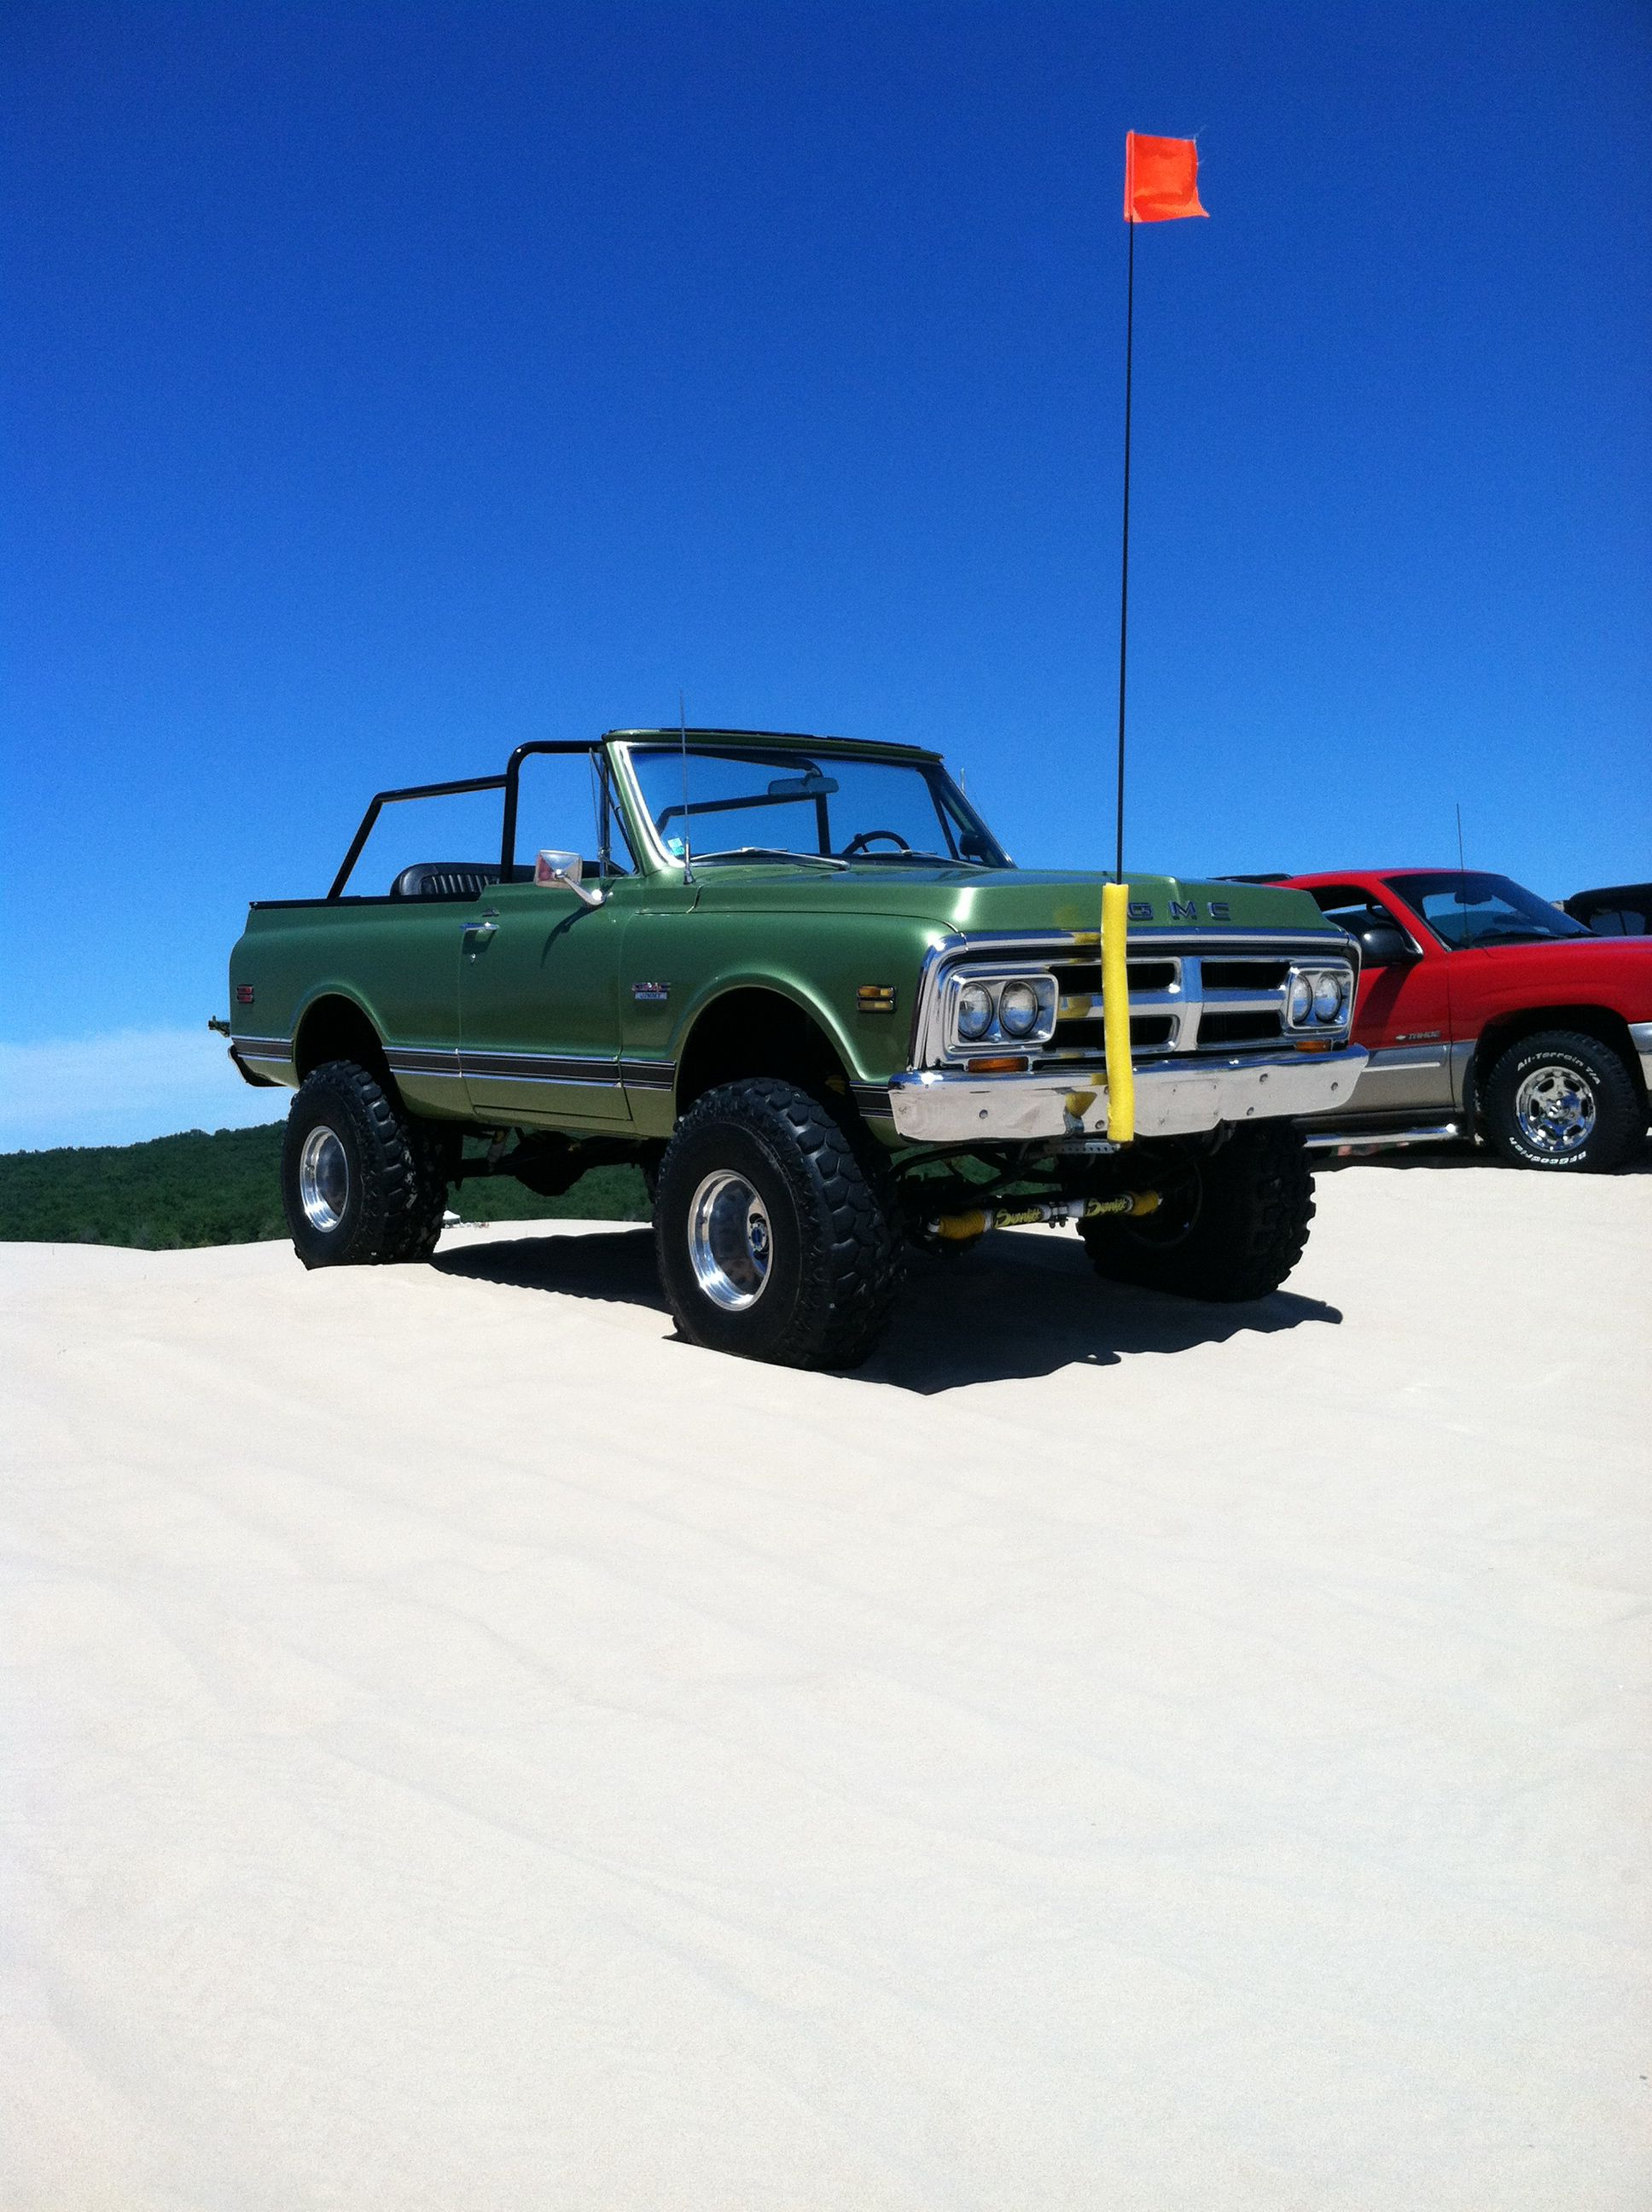 1972 Gmc Jimmy Silver Lake Sand Dunes Chevy Blazer K5 Chevrolet Blazer Silver Lake Sand Dunes